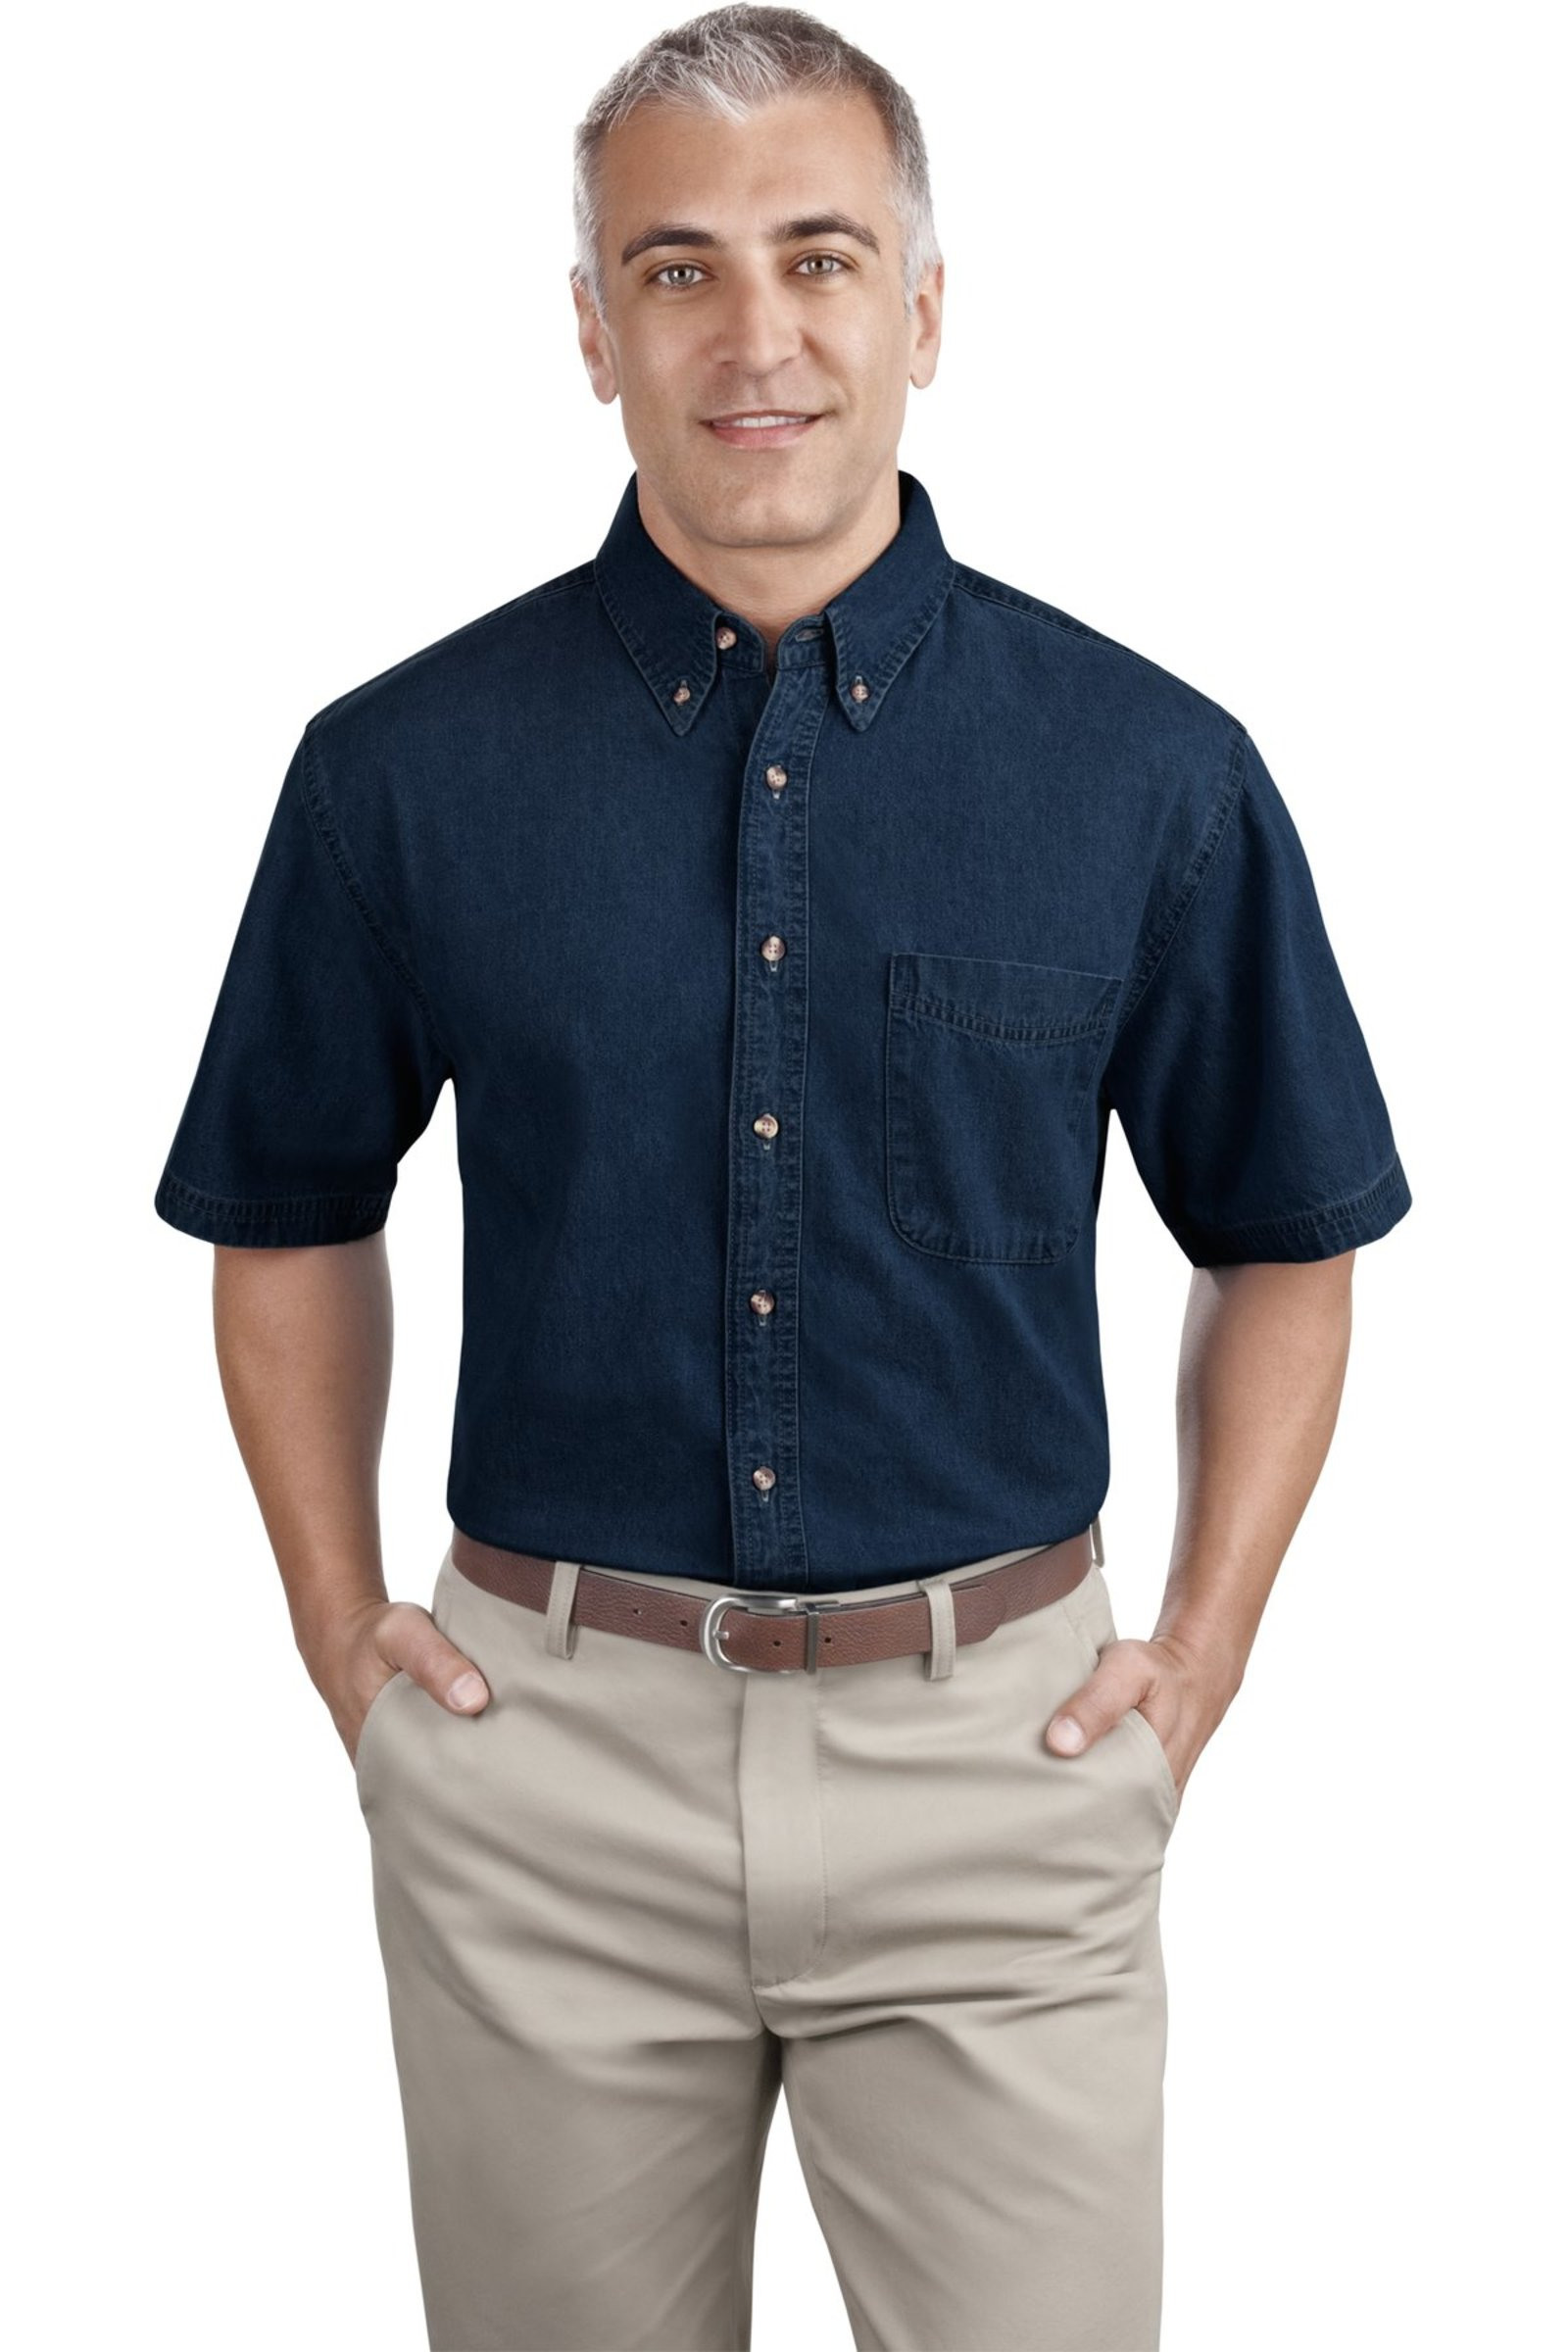 Port & Company Embroidered Men's Short Sleeve Denim Shirt